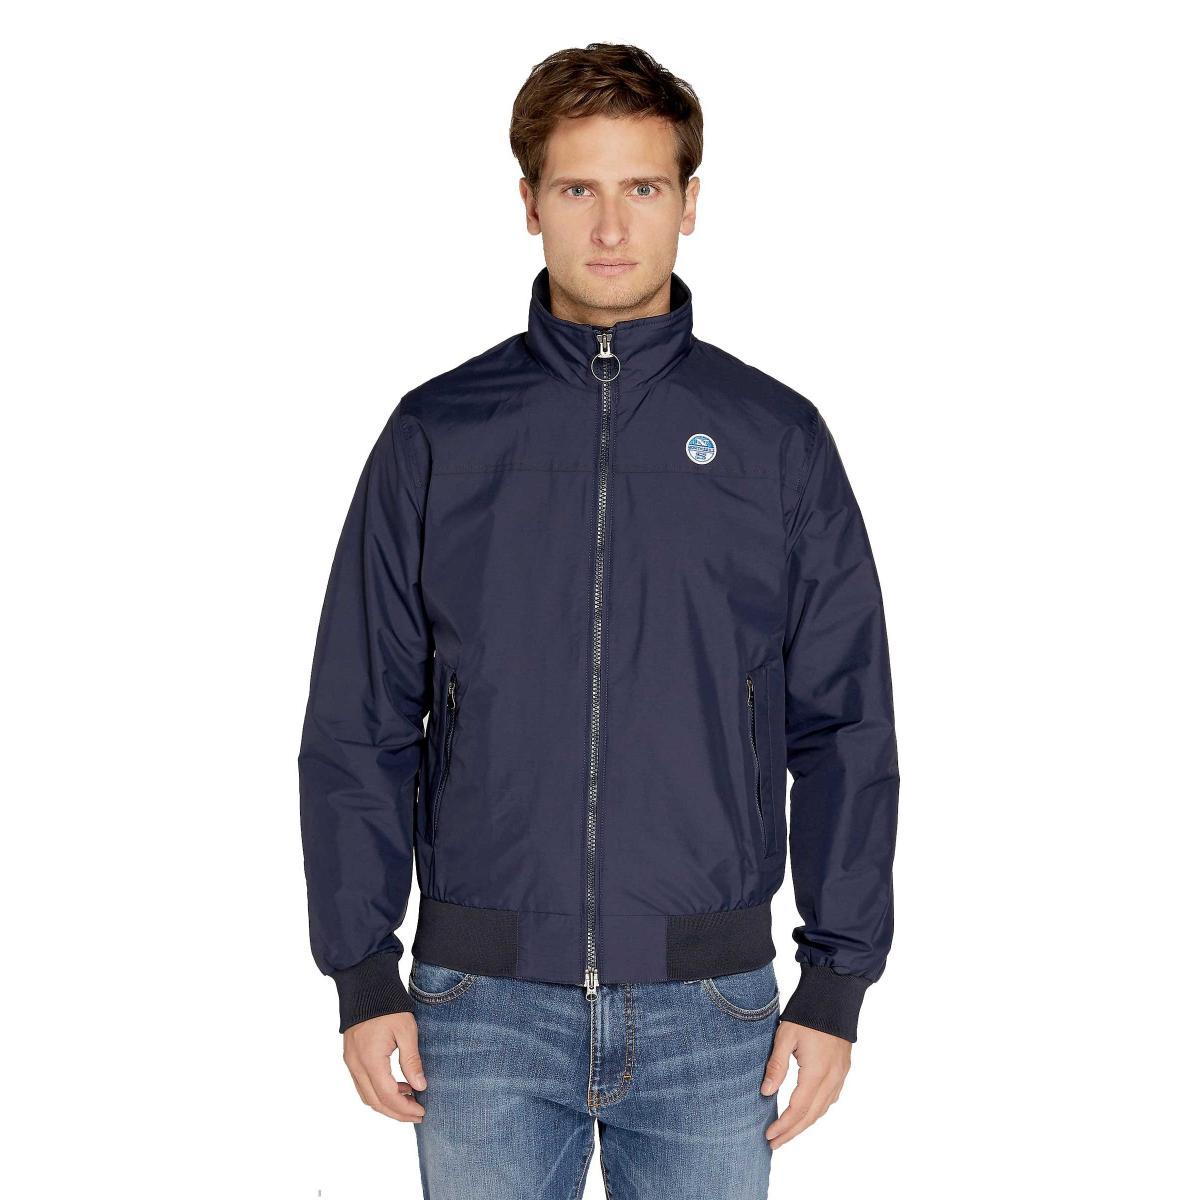 Giubbotto NORTH SAILS Sailor Slim Jacket da uomo rif. 60 2656 000